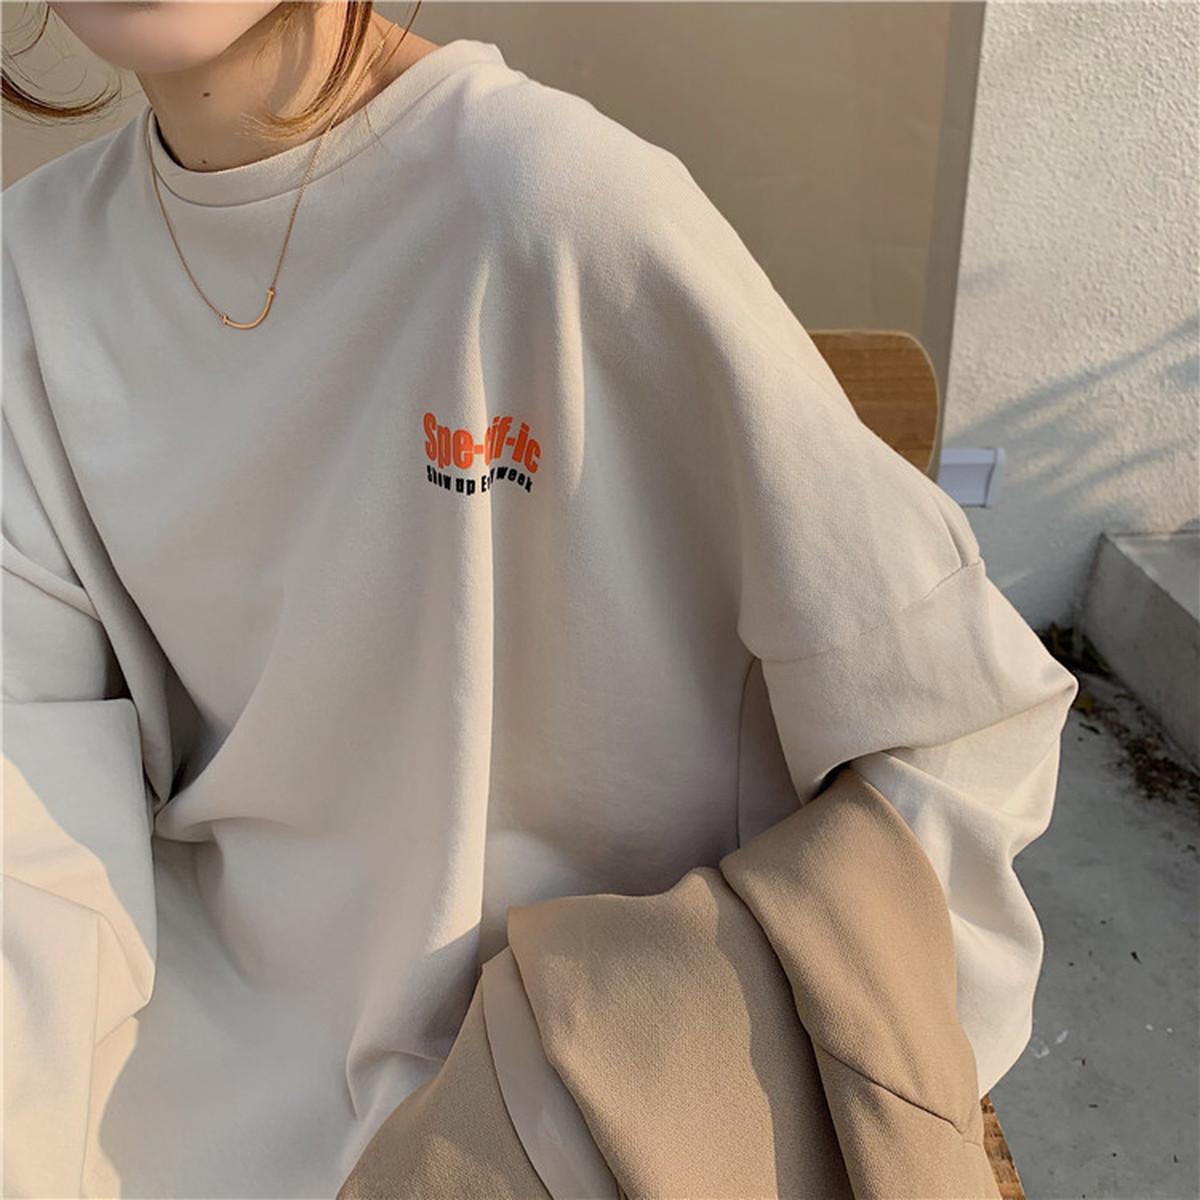 968224 in kobaltürkis 36//38 Nouveau Oversize-Sweat-shirt